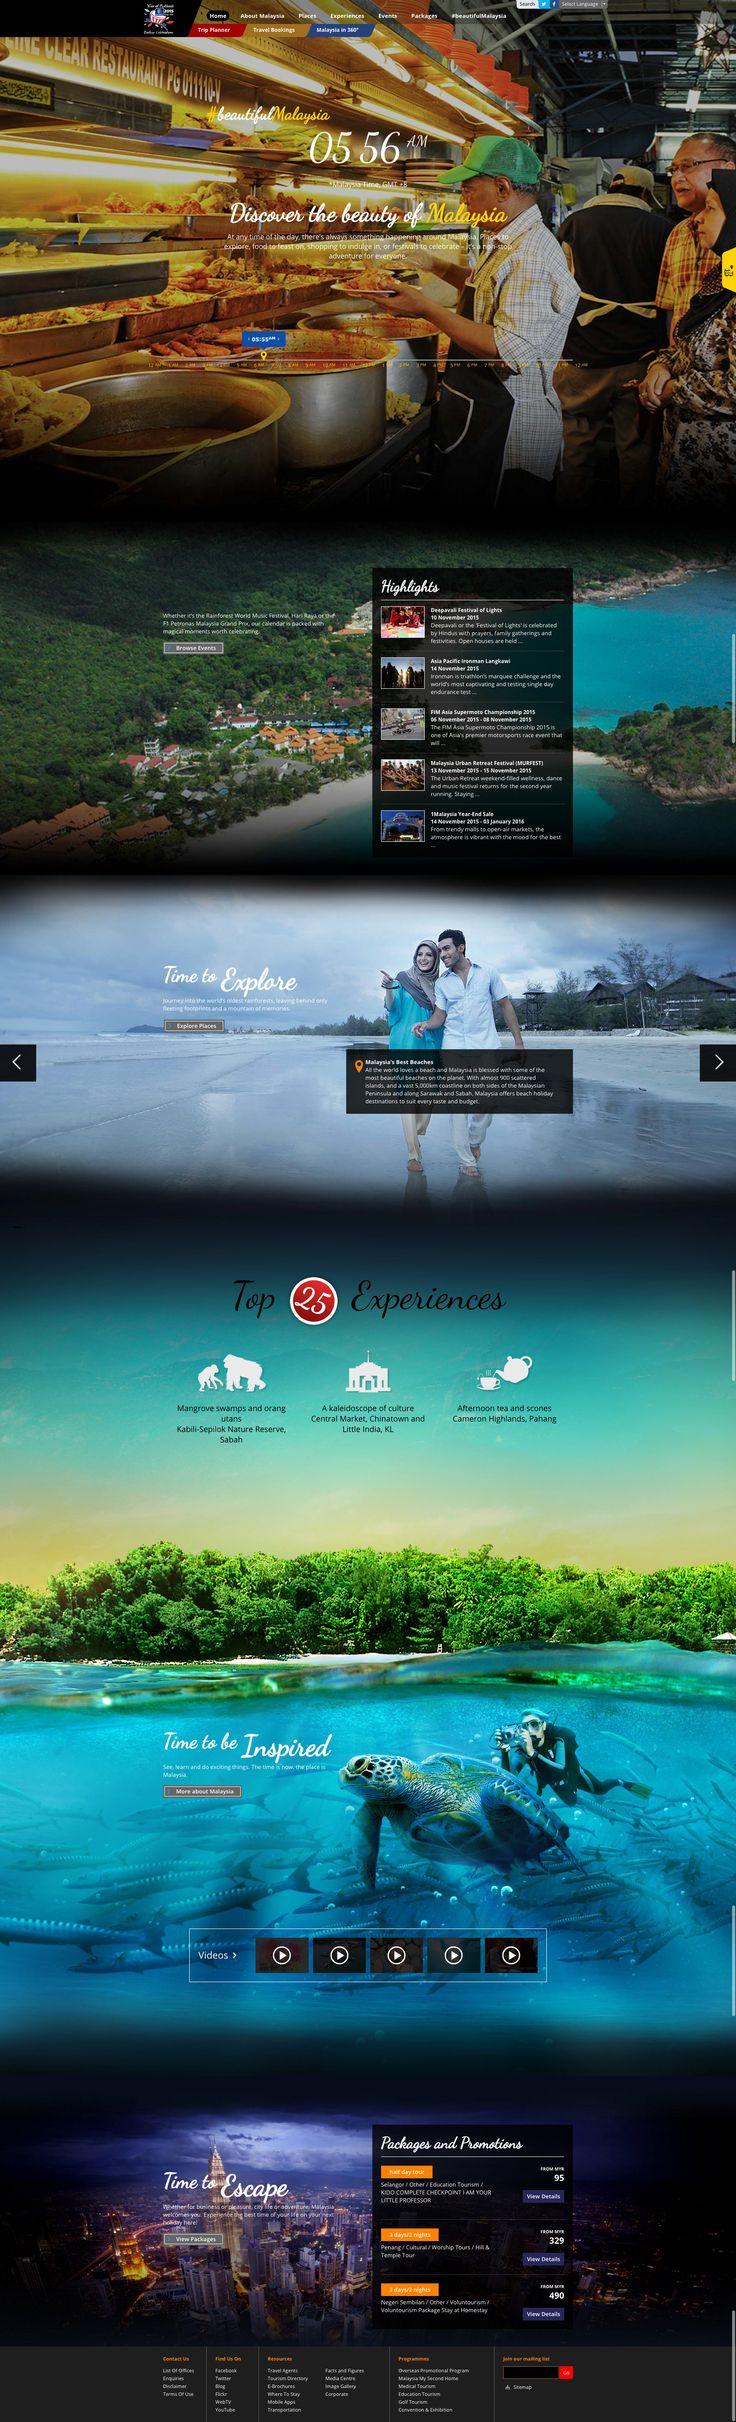 Travel Malaysia destination tourism travel website #destination #travel #tourism #webdesign